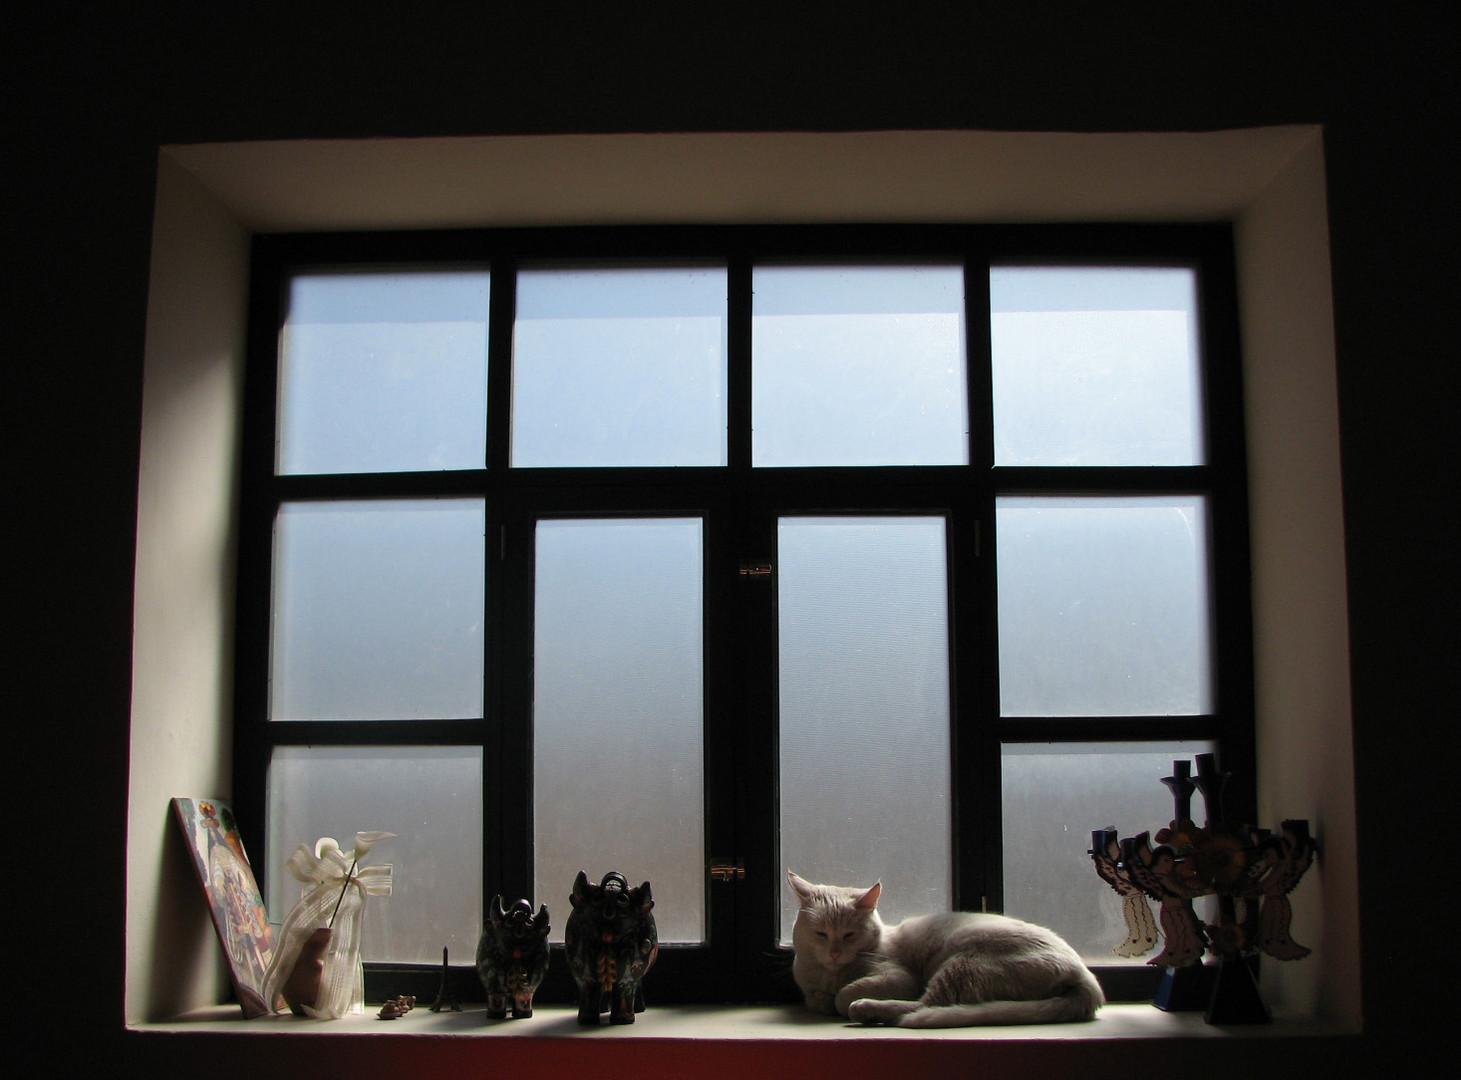 Aaron en la ventana